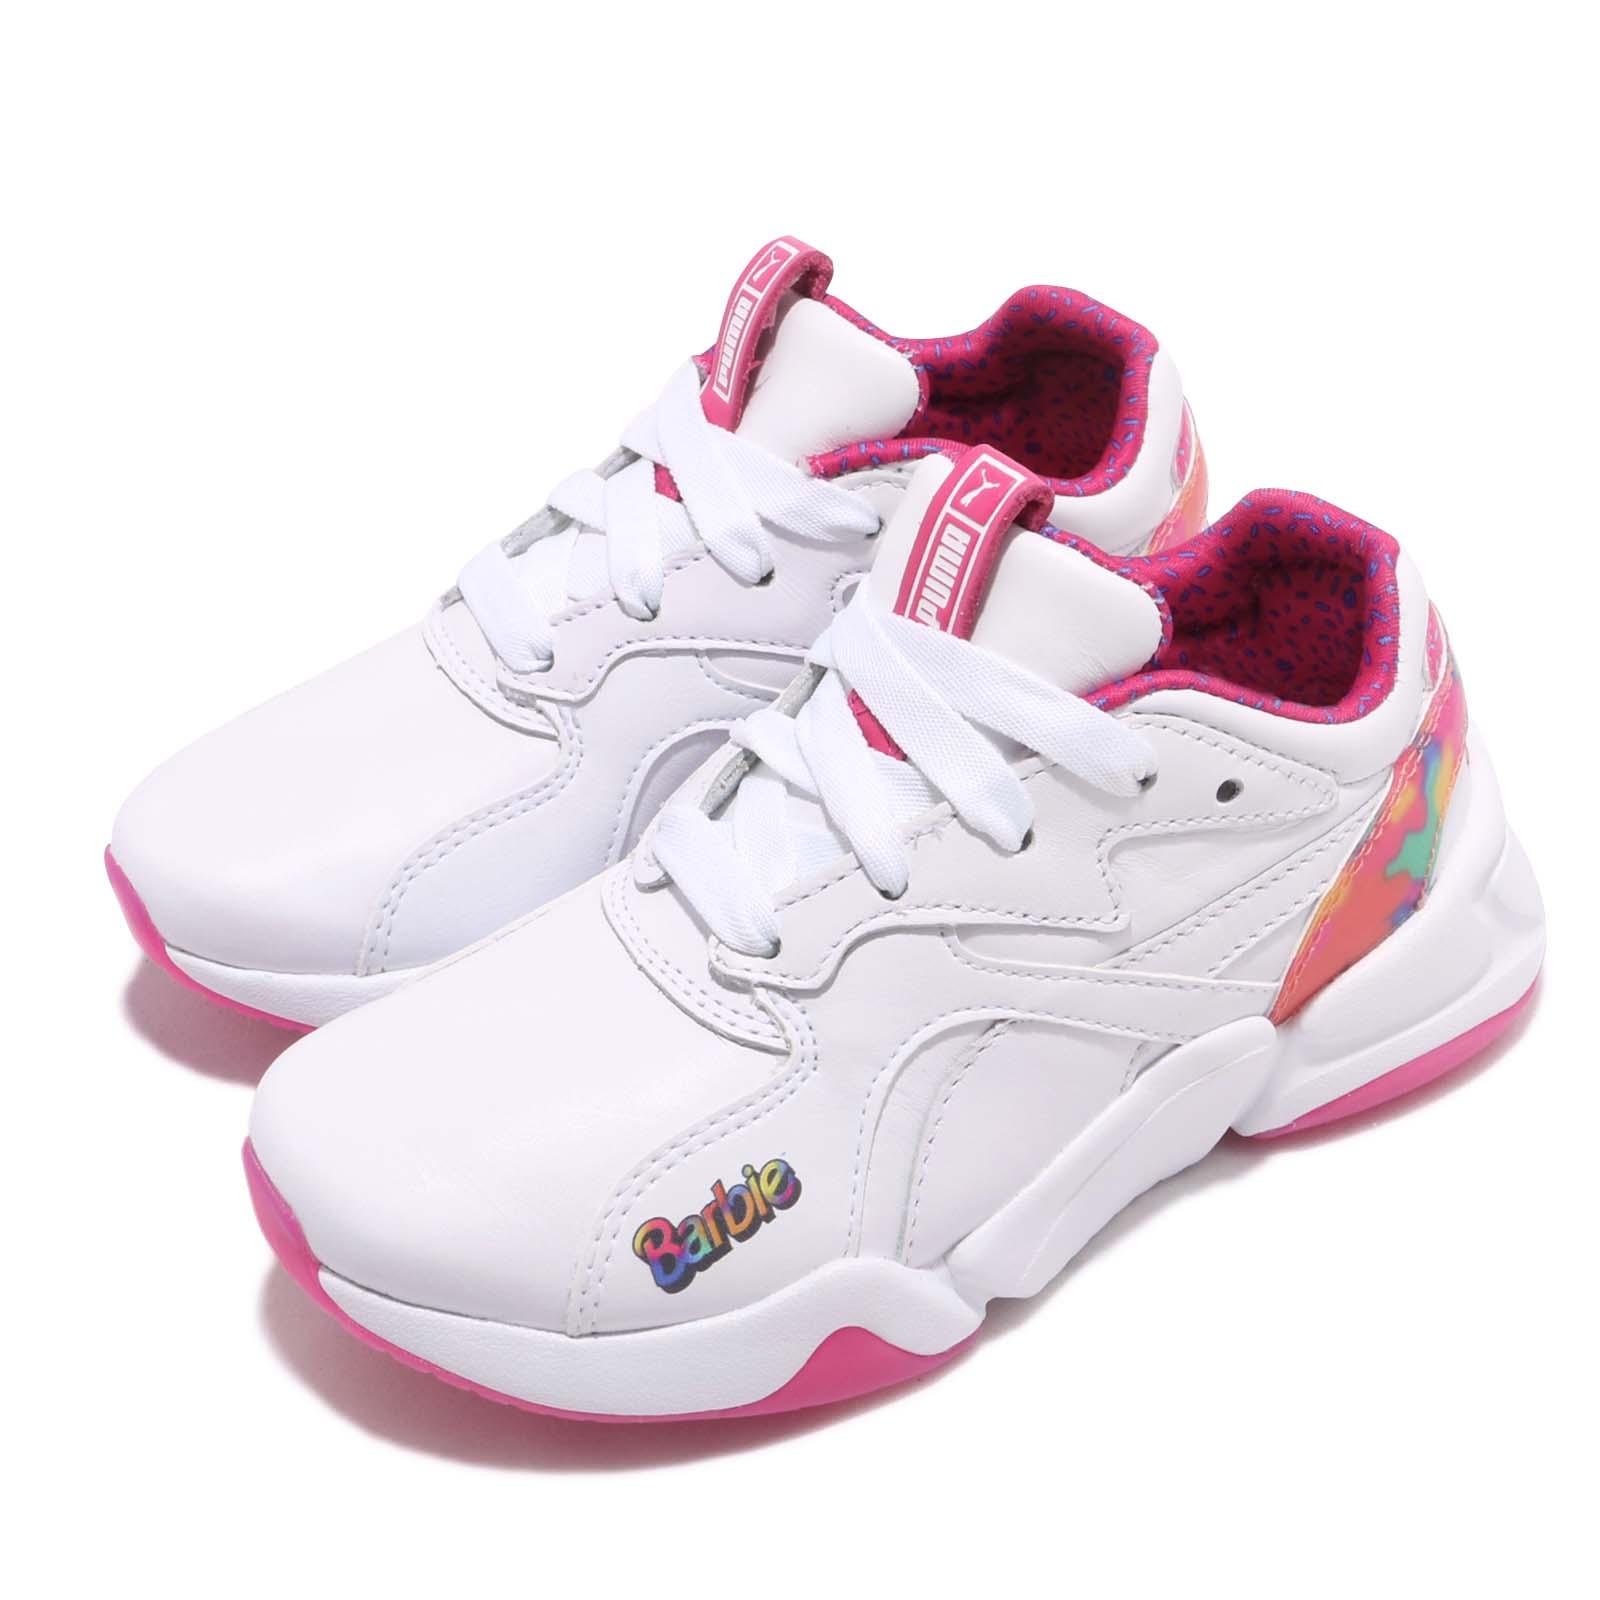 Puma 休閒鞋 Nova x Barbie FL 童鞋 37158501